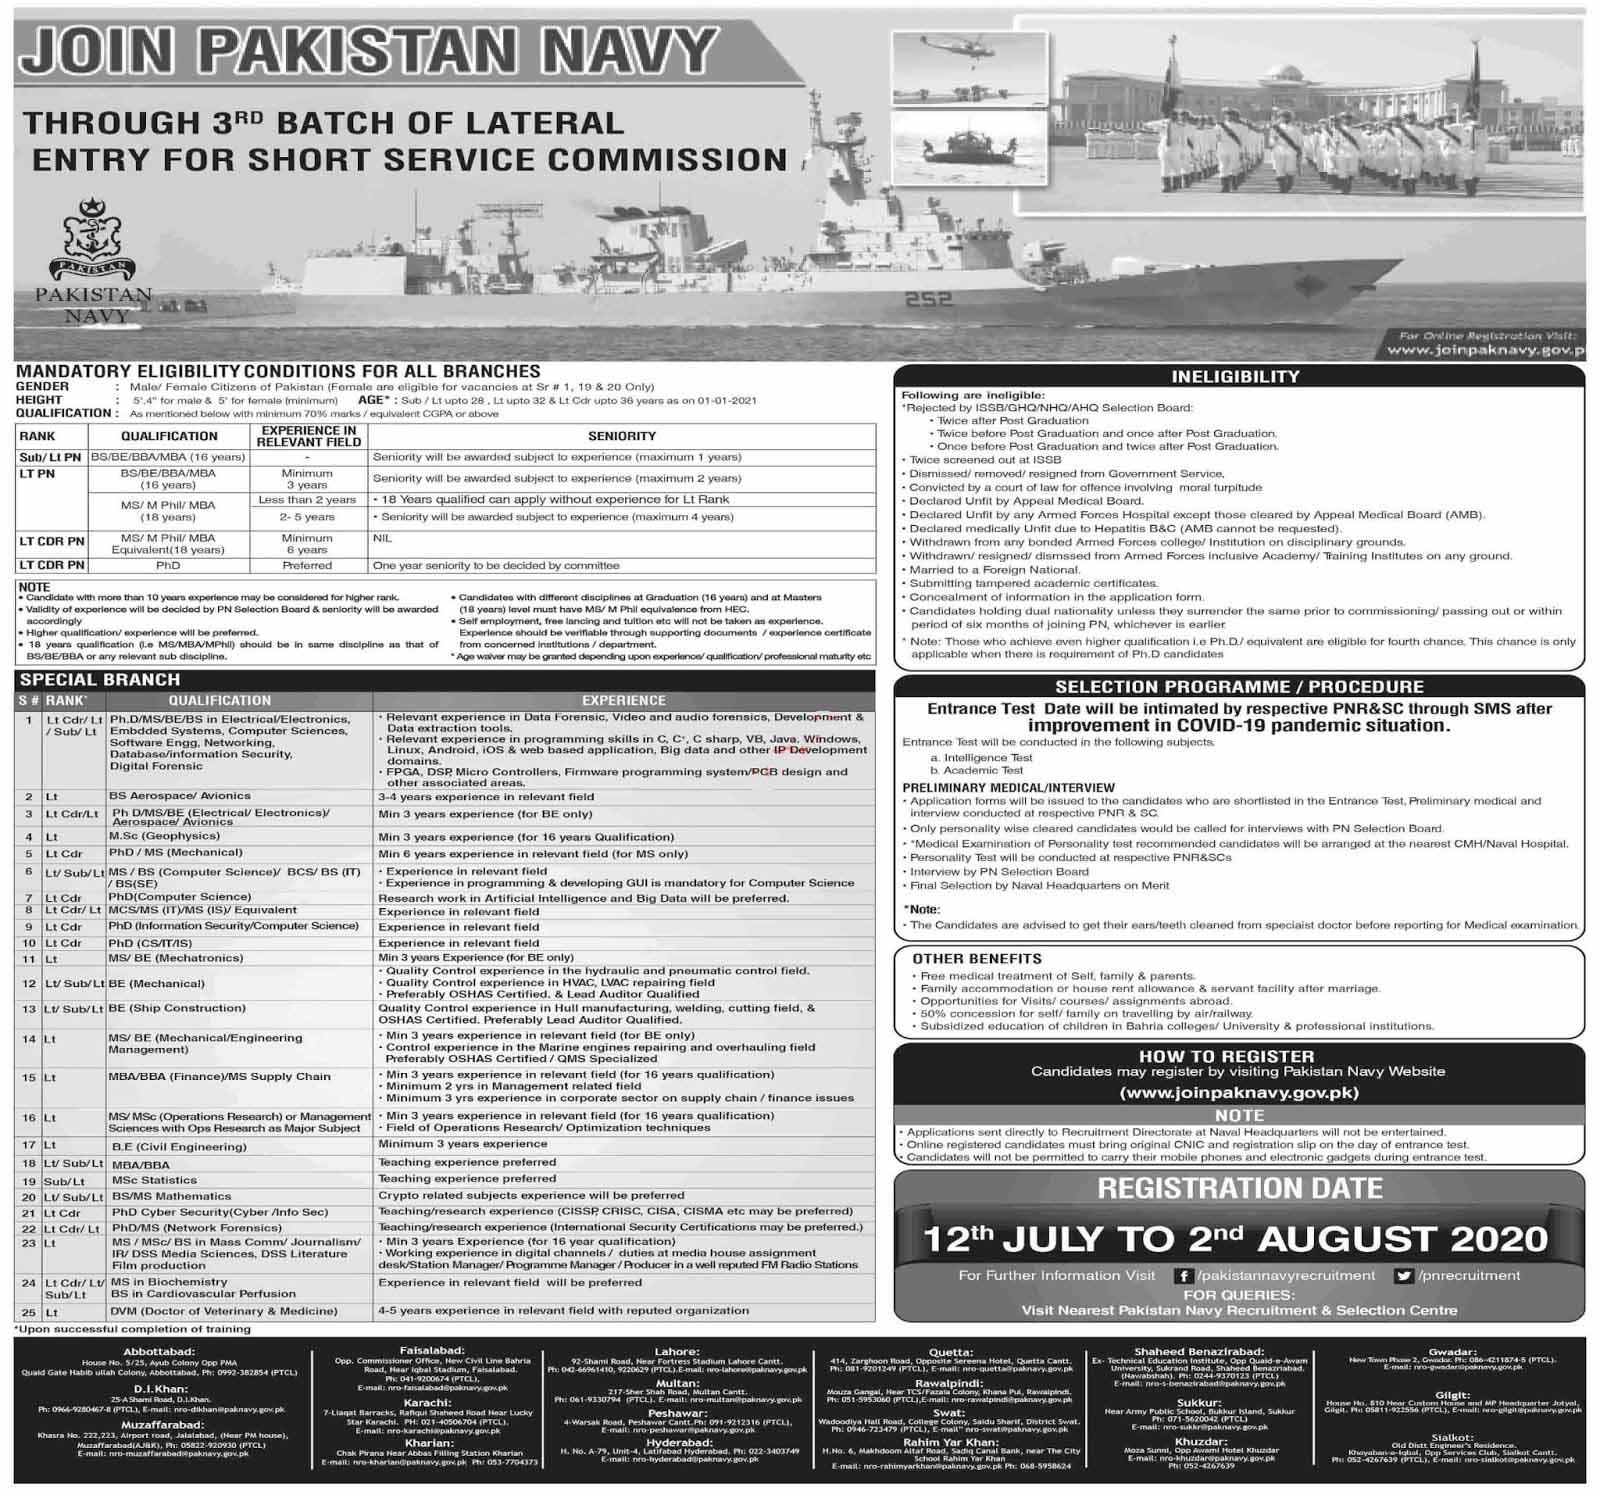 Pakistan Navy Short Service Commission 2020